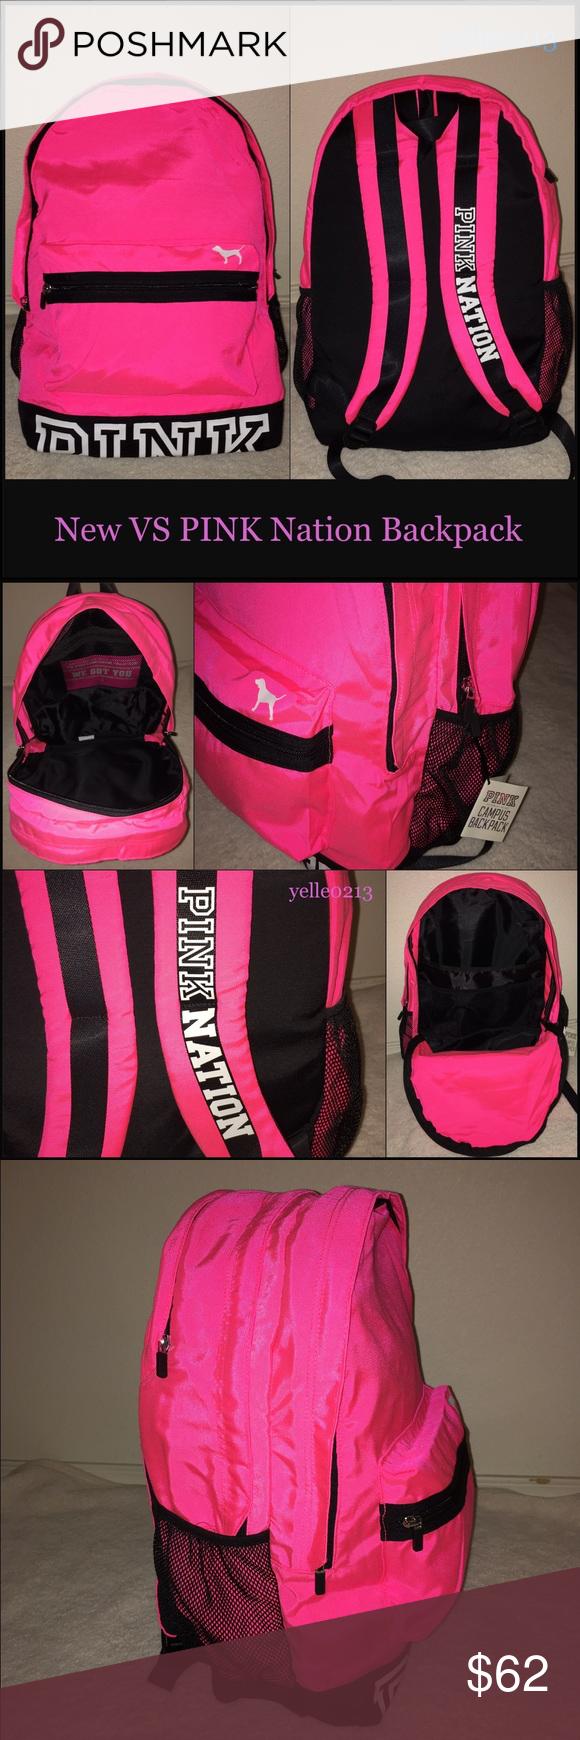 c5edc606b2 Nwt Victoria s Secret PINK Nation Backpack Brand New 100% Auth. Victoria s  Secret PINK Nation Backpack.. Measurements  13